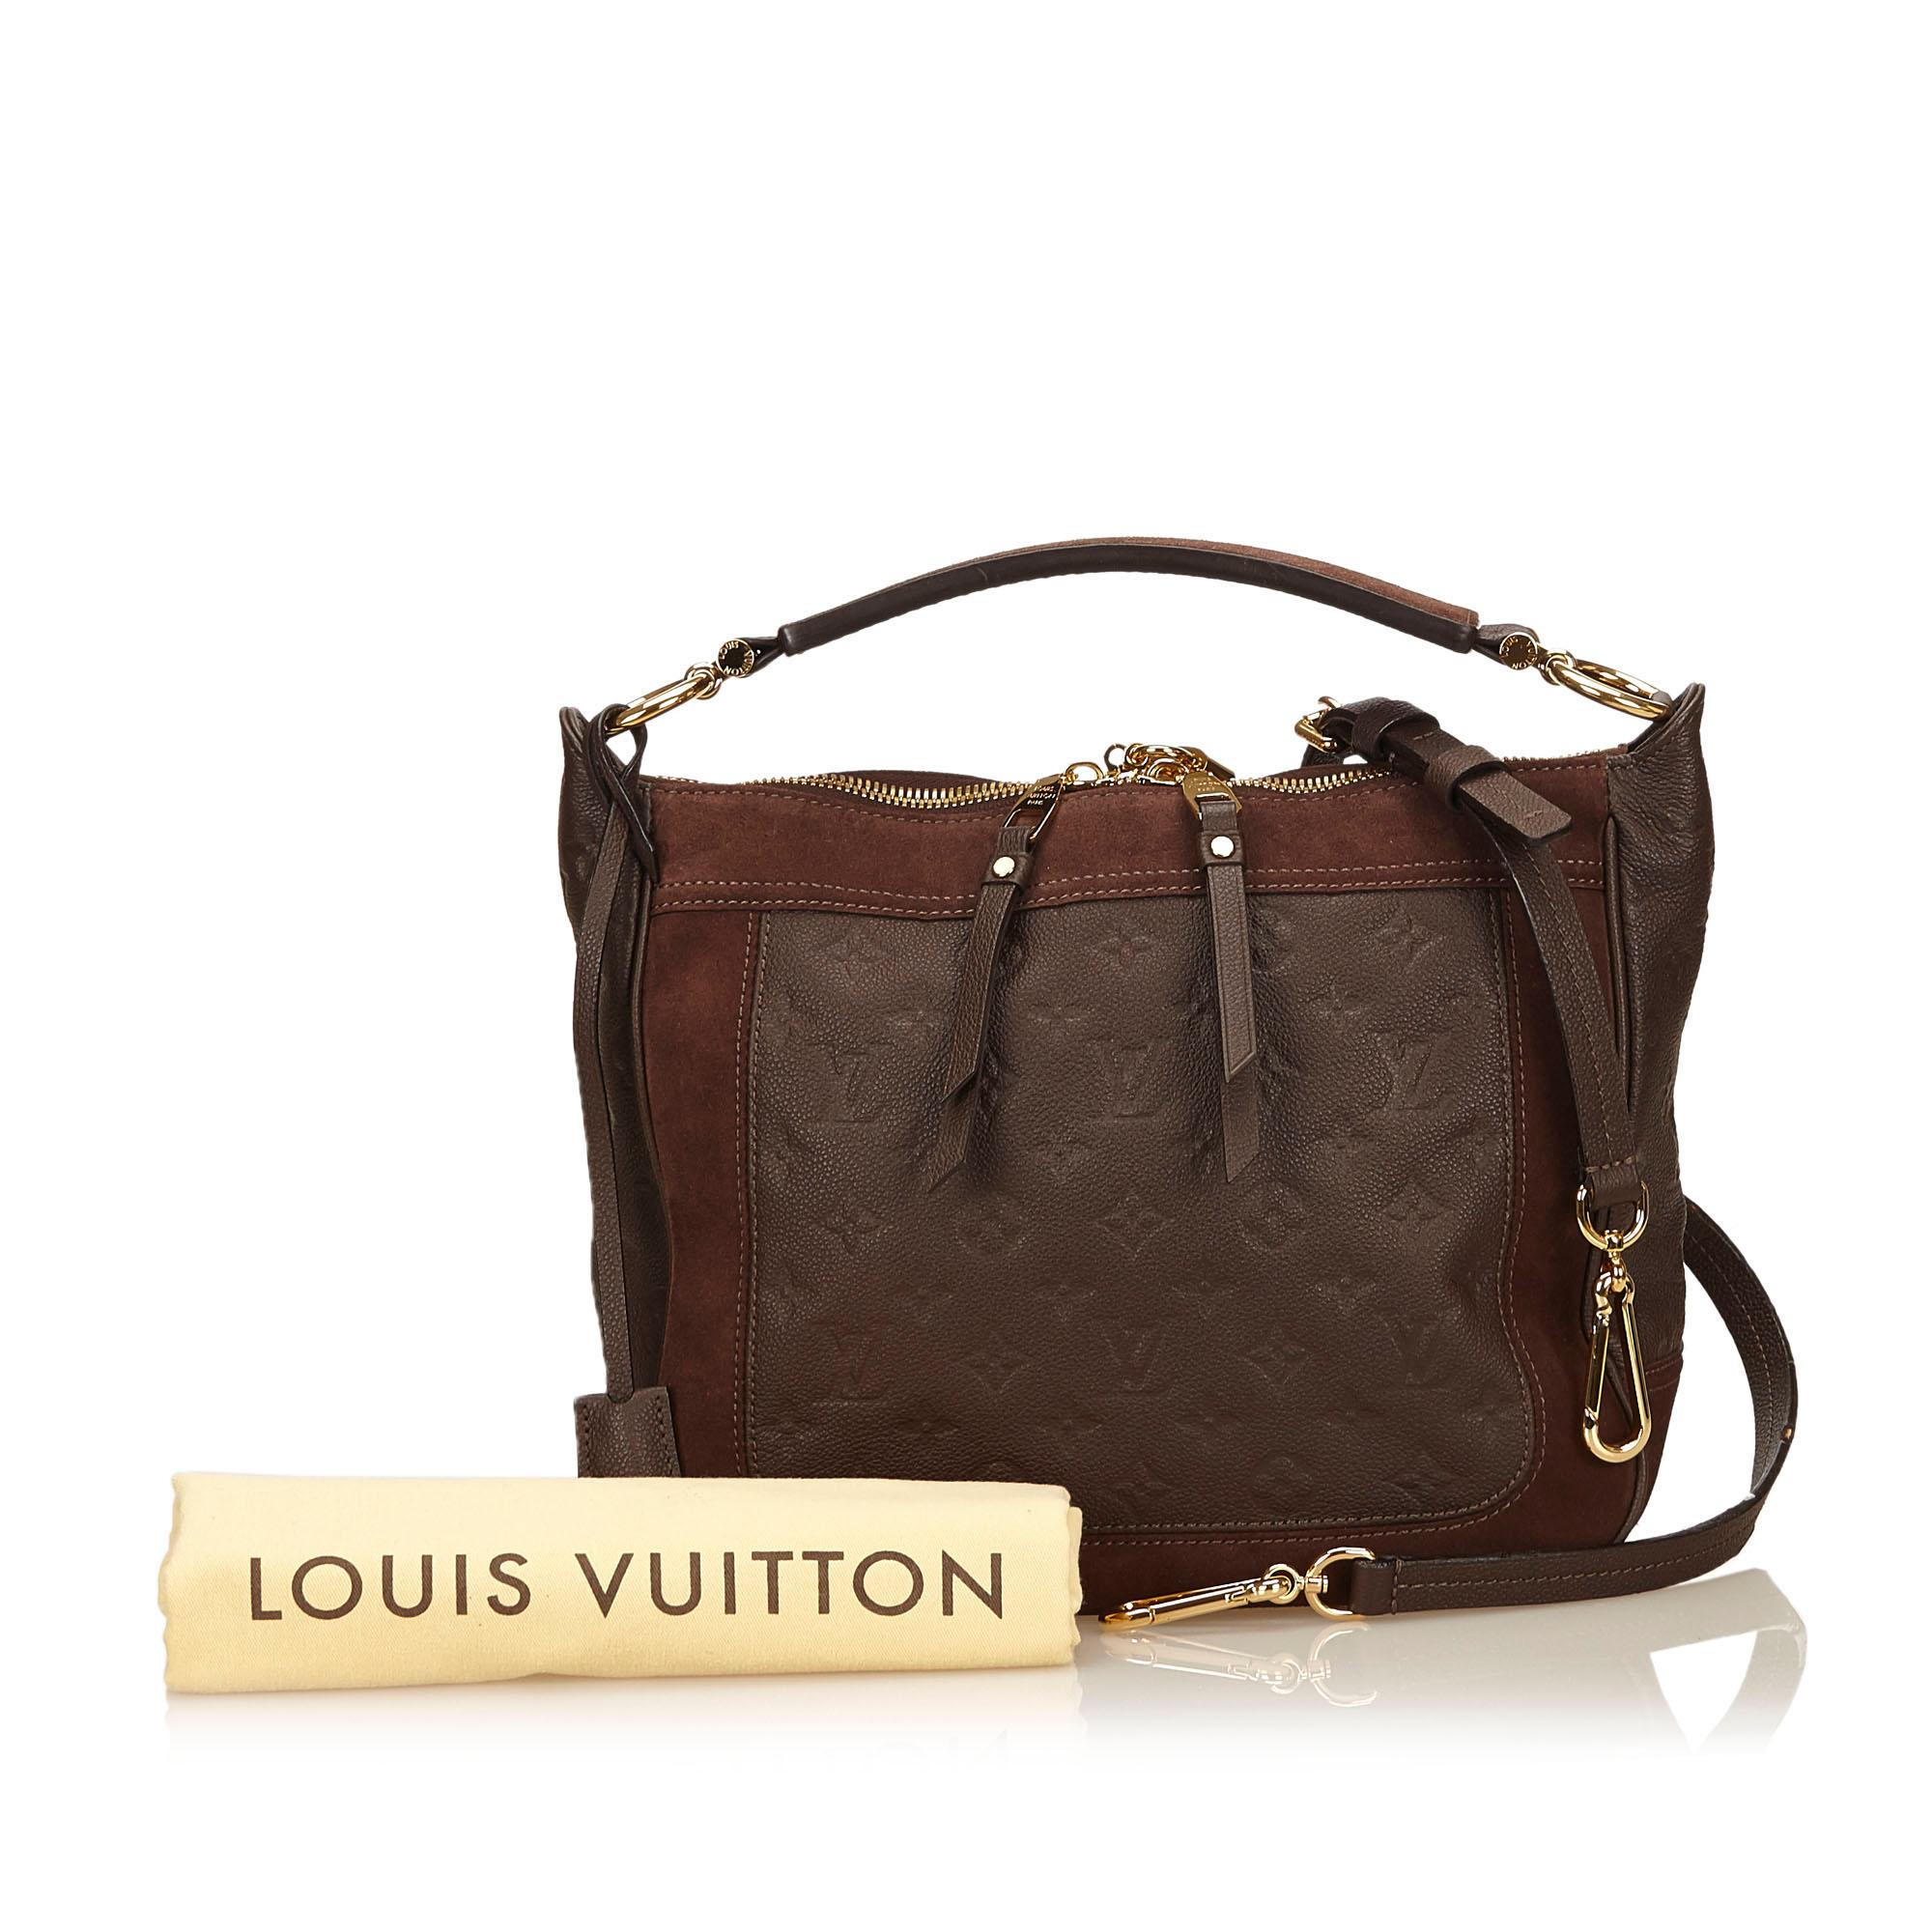 3e18ddcd1c55 Lyst - Louis Vuitton Brown Empreinte Leather Audacieuse Pm in Brown